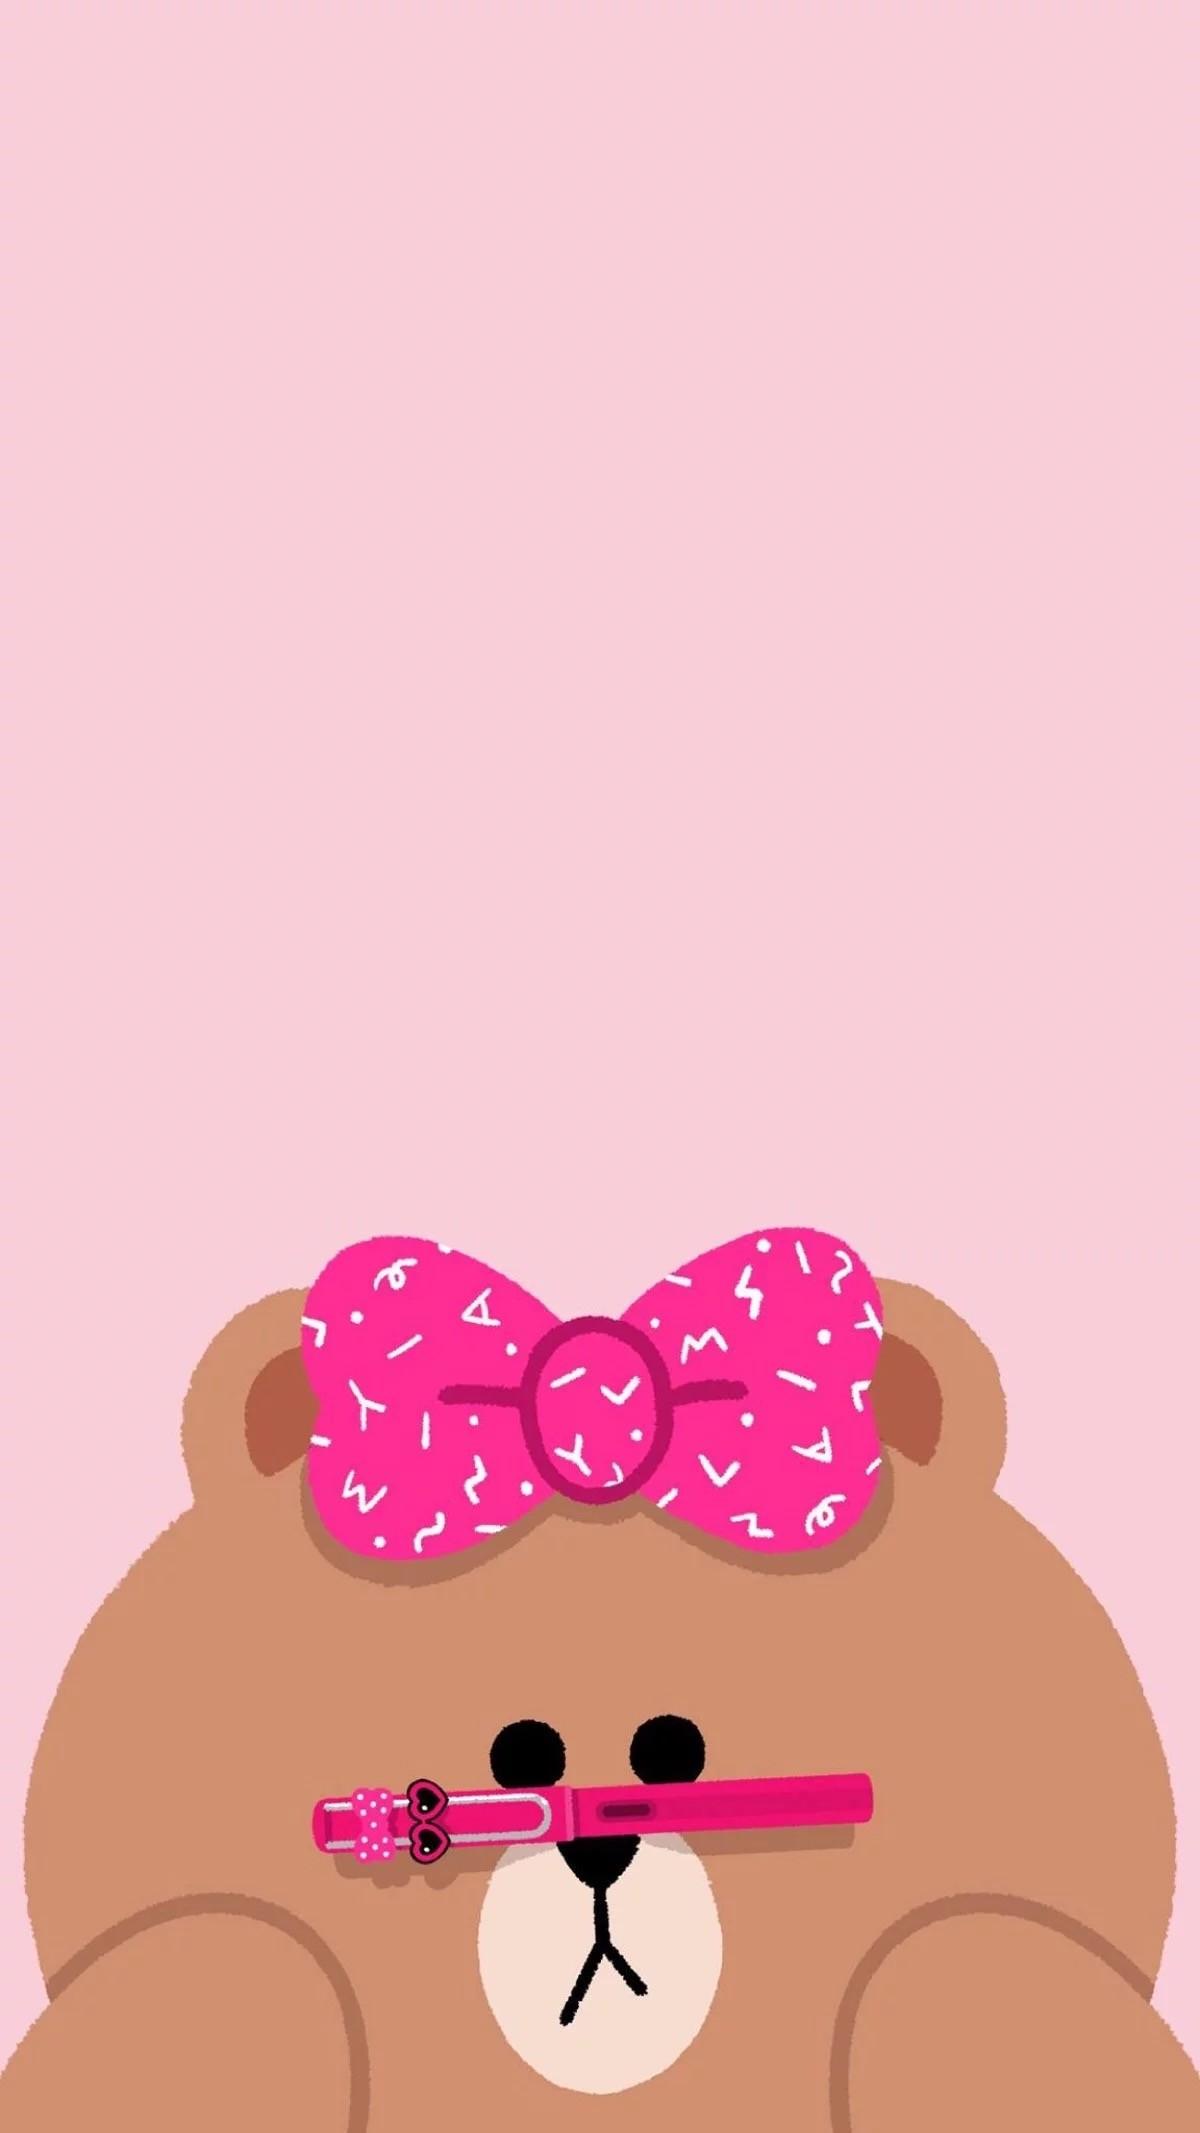 1200x2134 Cute Cartoon, Rilakkuma, Random Acts, Iphone Wallpaper, Rabbit,  Kawaii